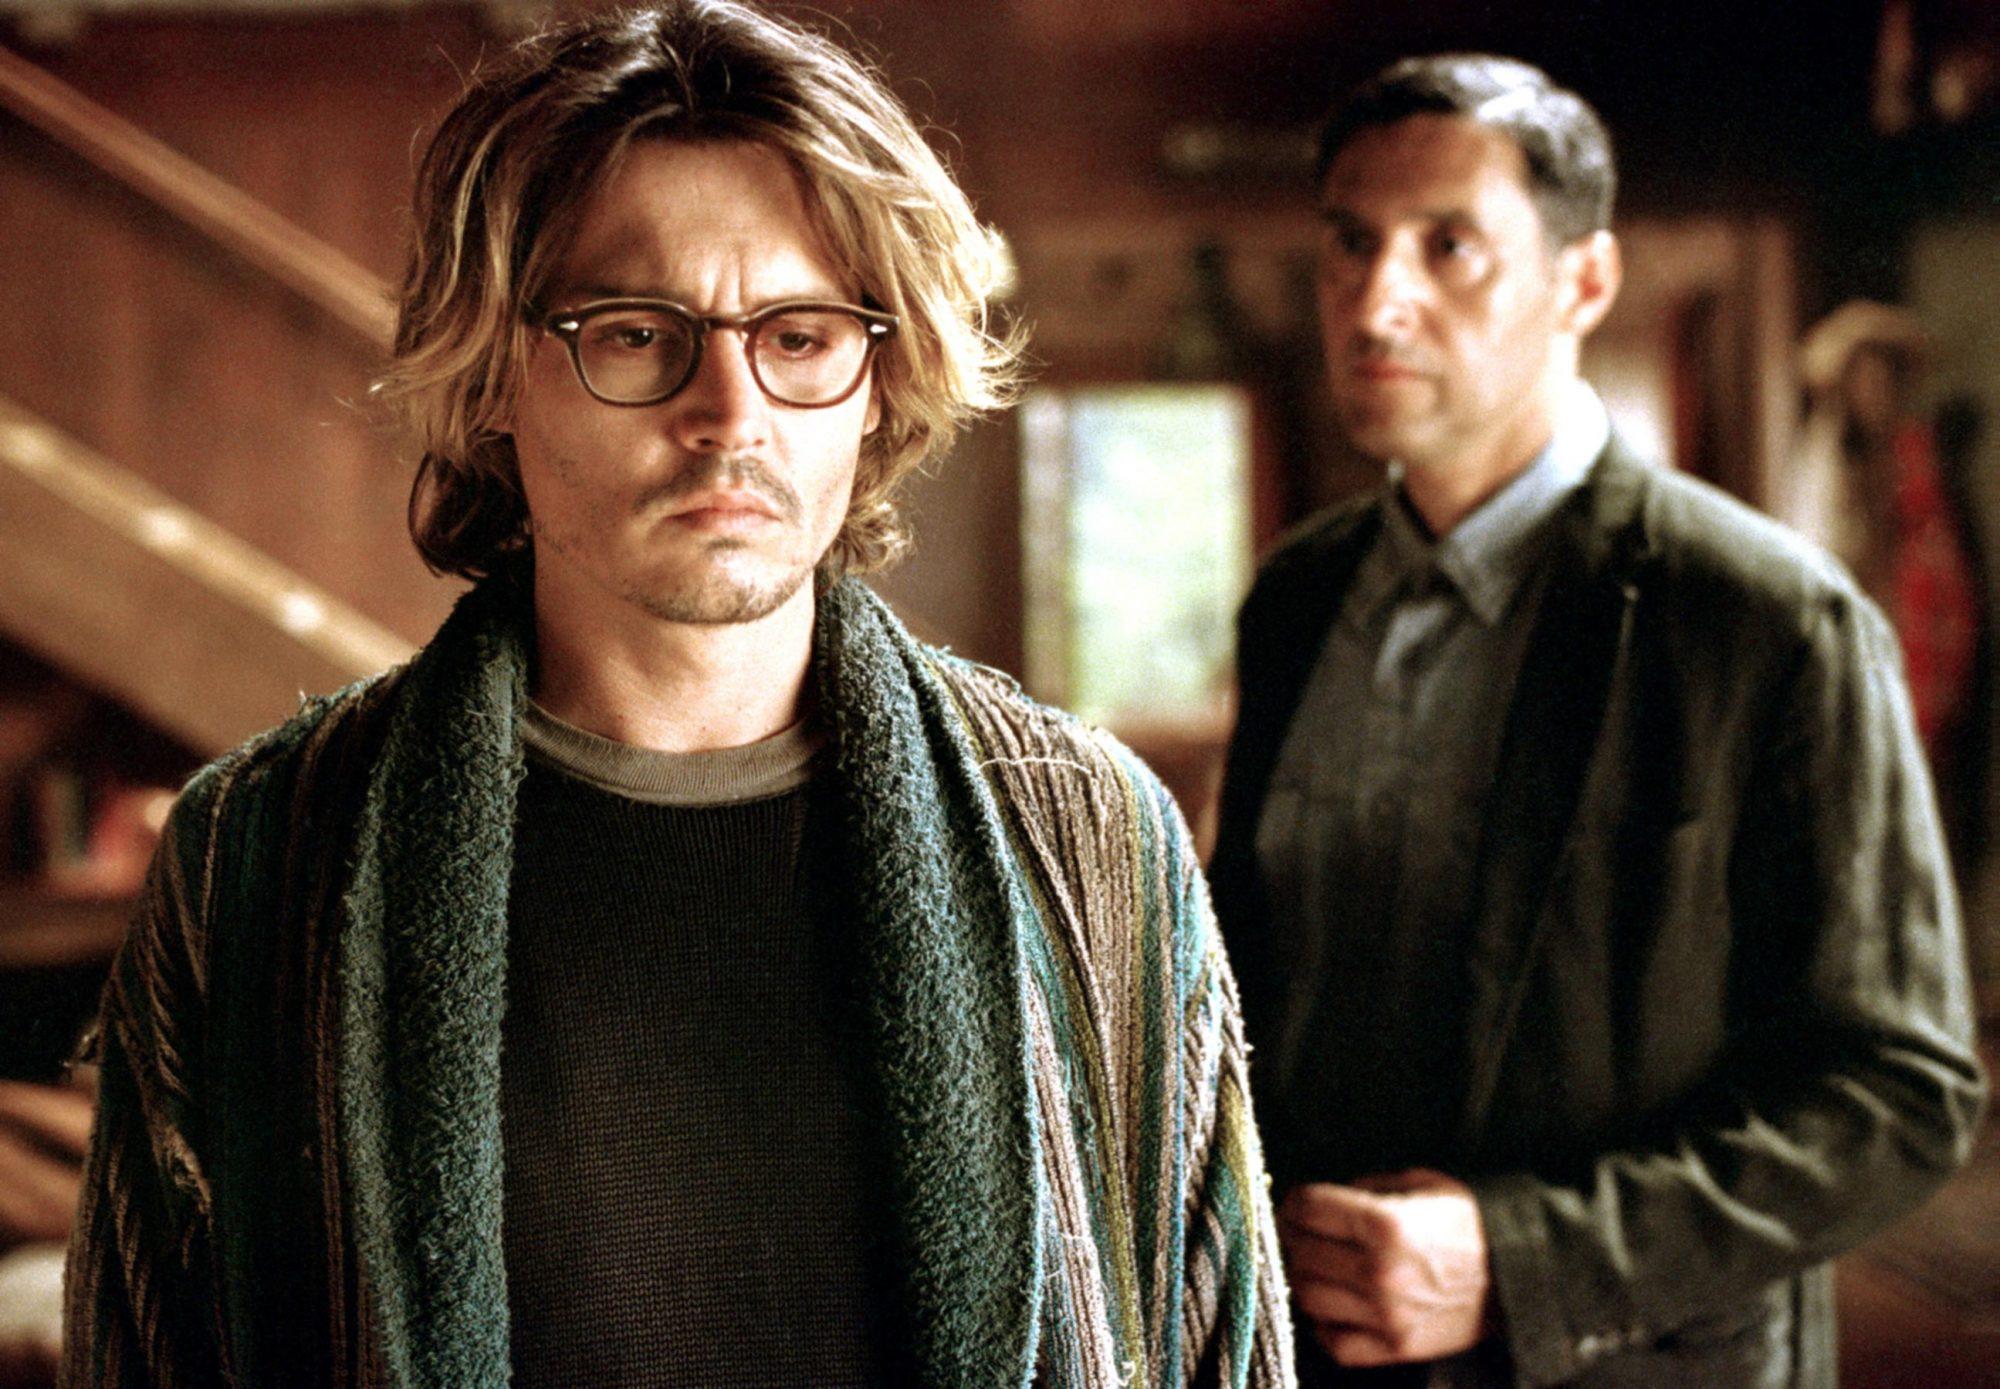 SECRET WINDOW, Johnny Depp, John Turturro, 2004, (c) Columbia/courtesy Everett Collection